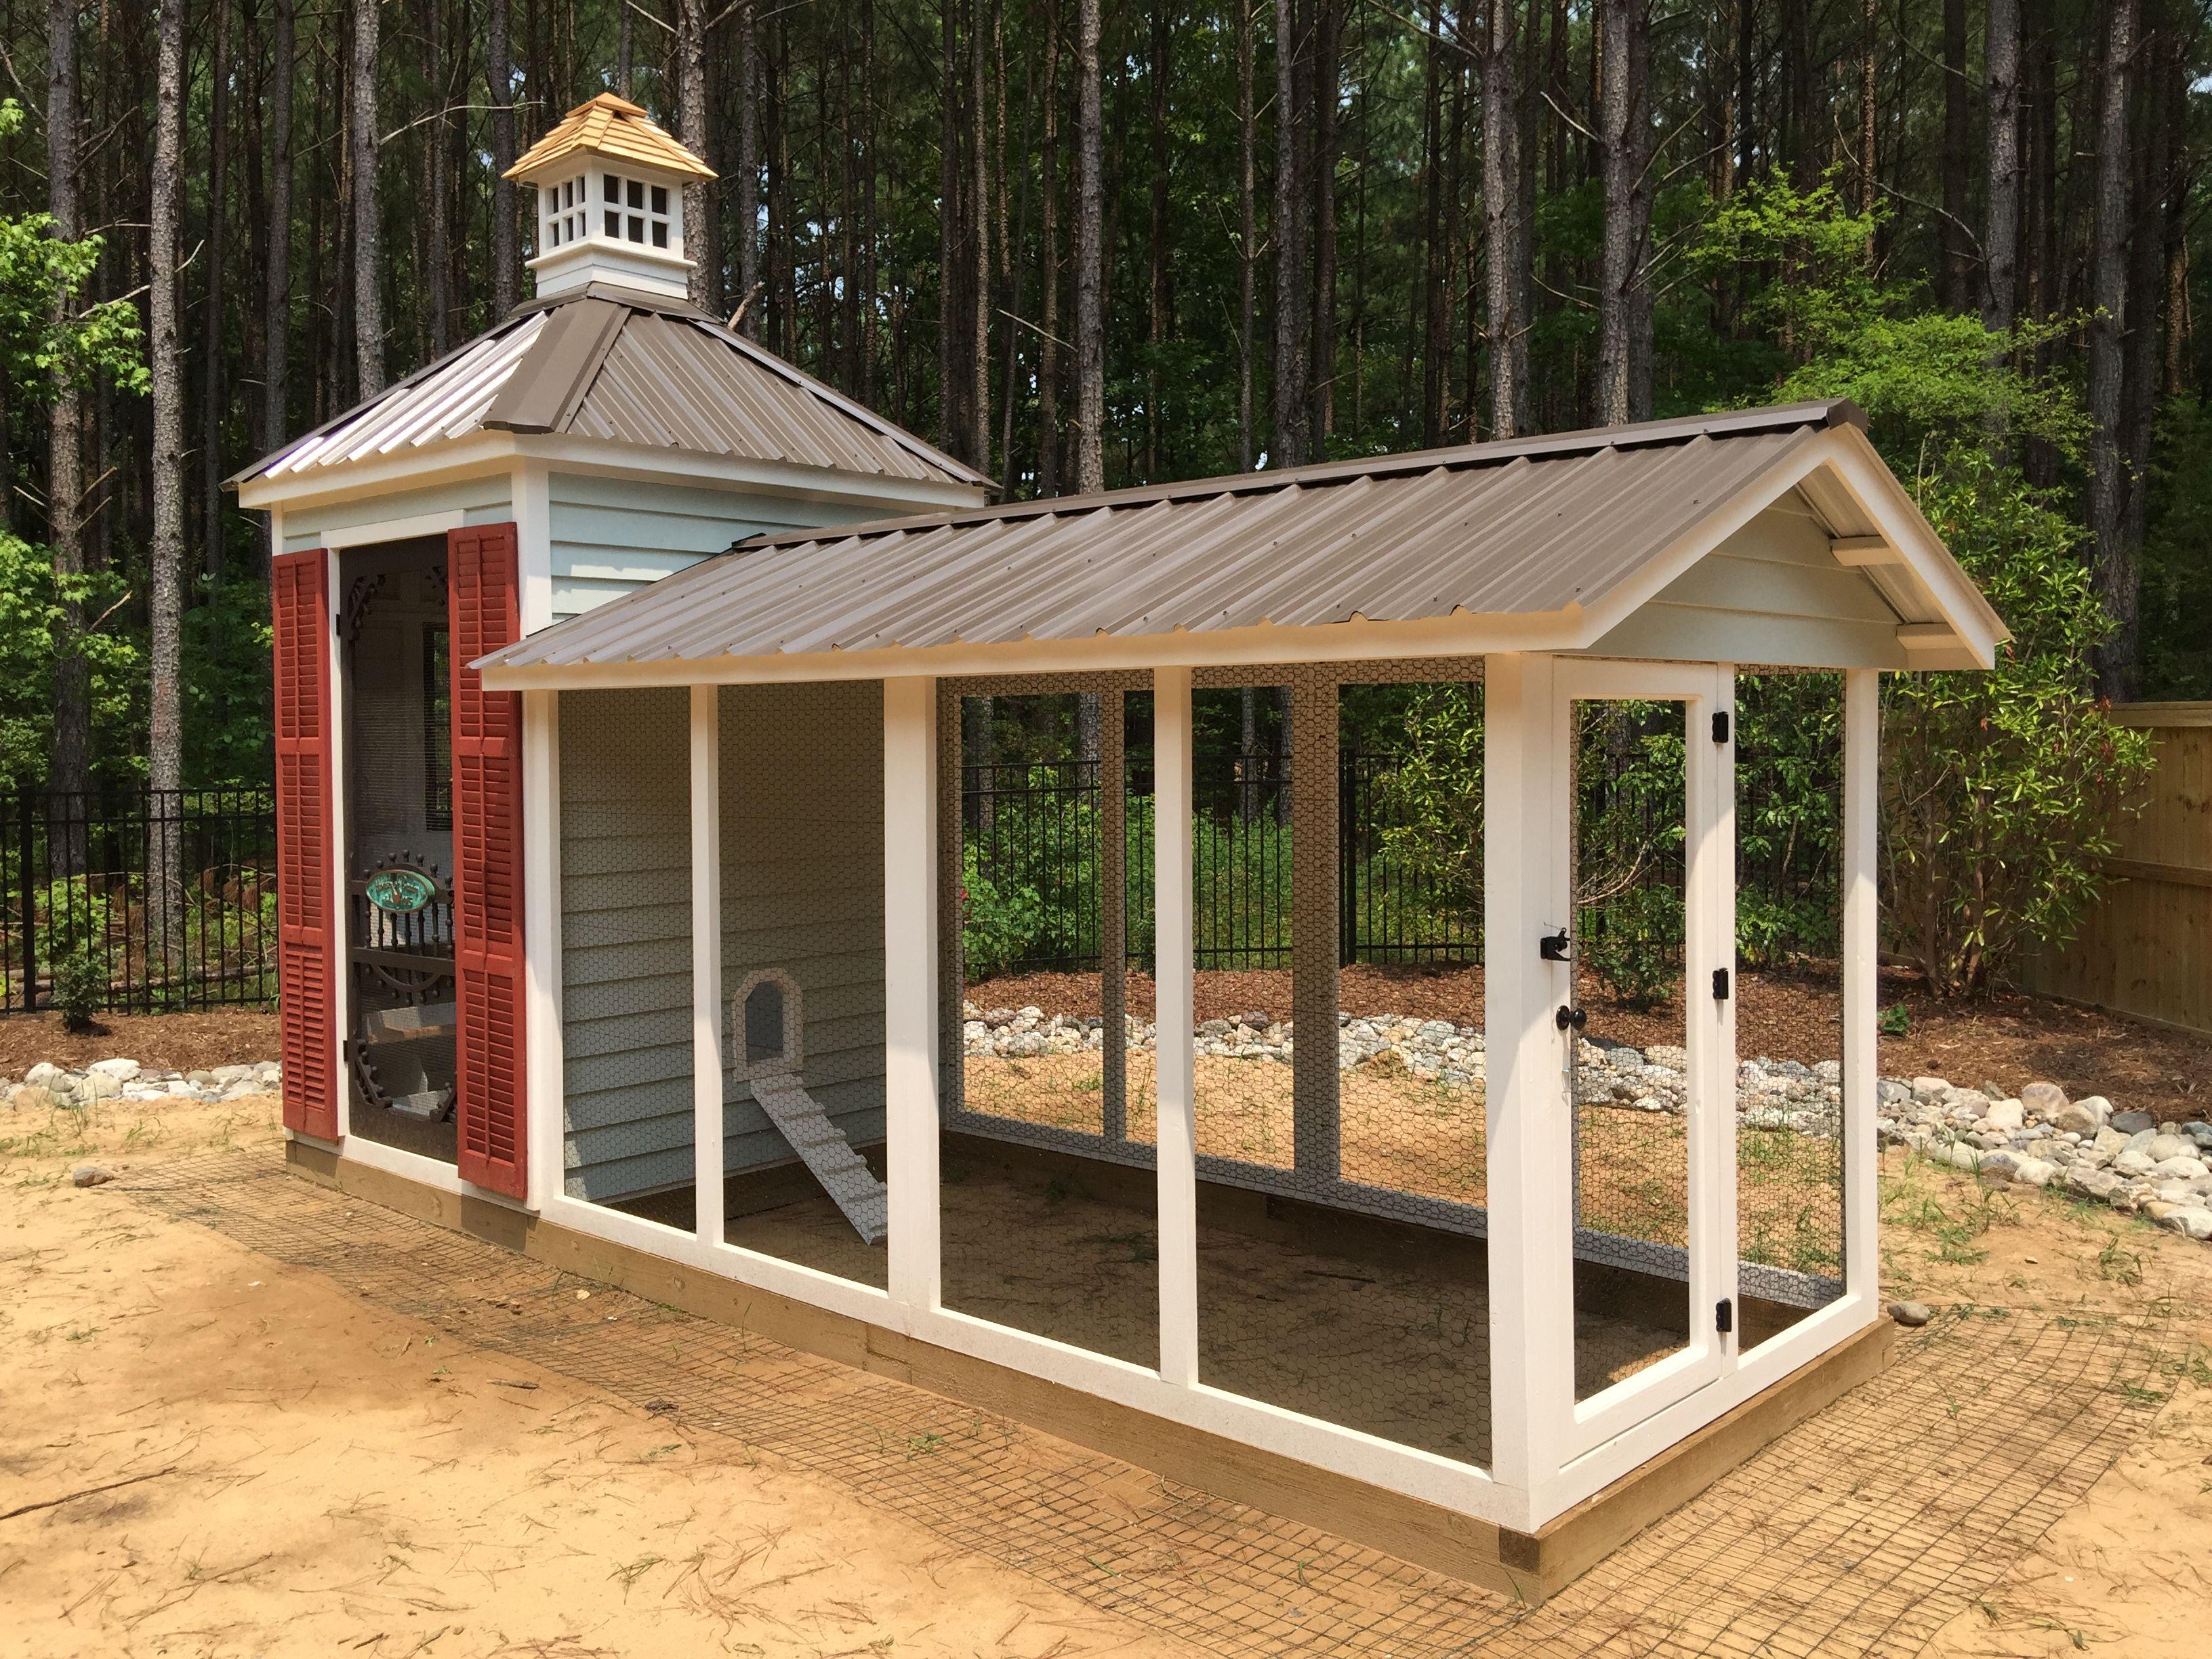 Carolina Chicken Coops | Chickens backyard, Backyard ...